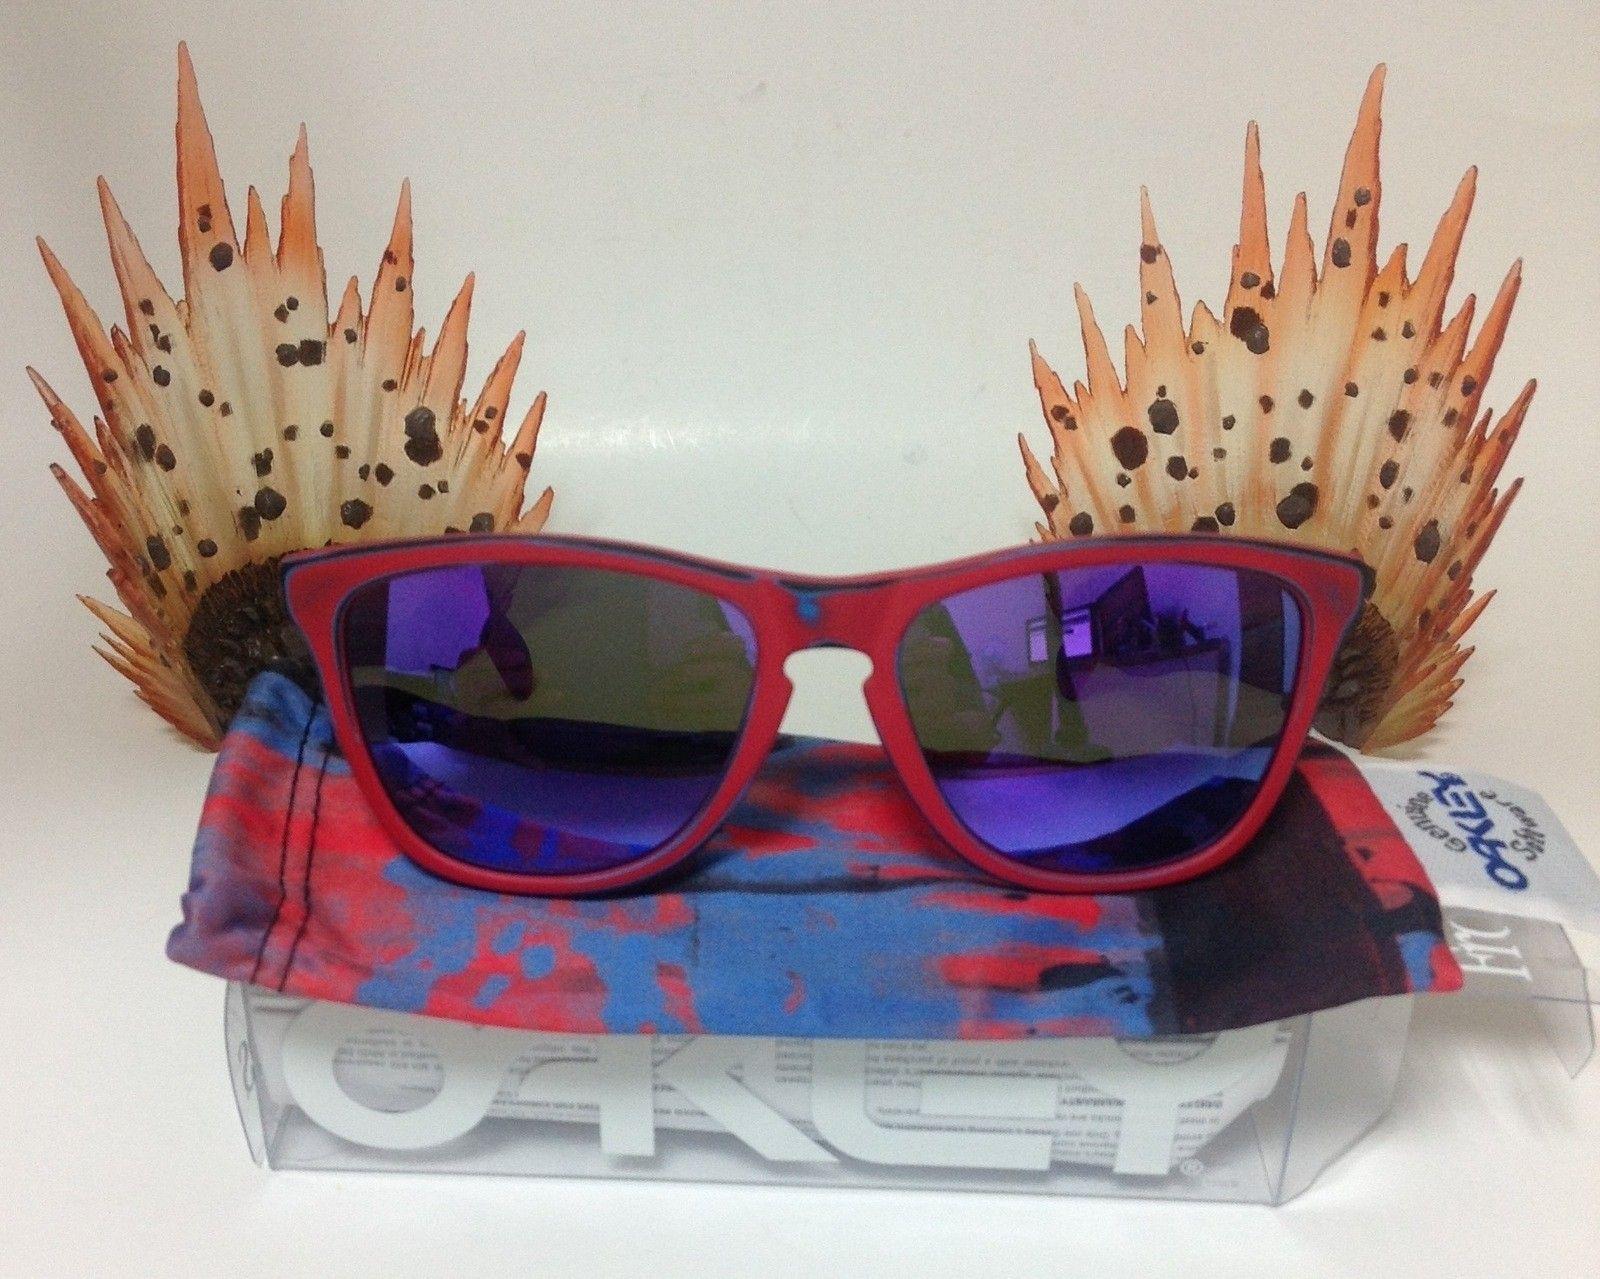 Oakley Matte Red Skate Deck Frogskins W/ IH Violet Iridium - DMB2Rrx.jpg